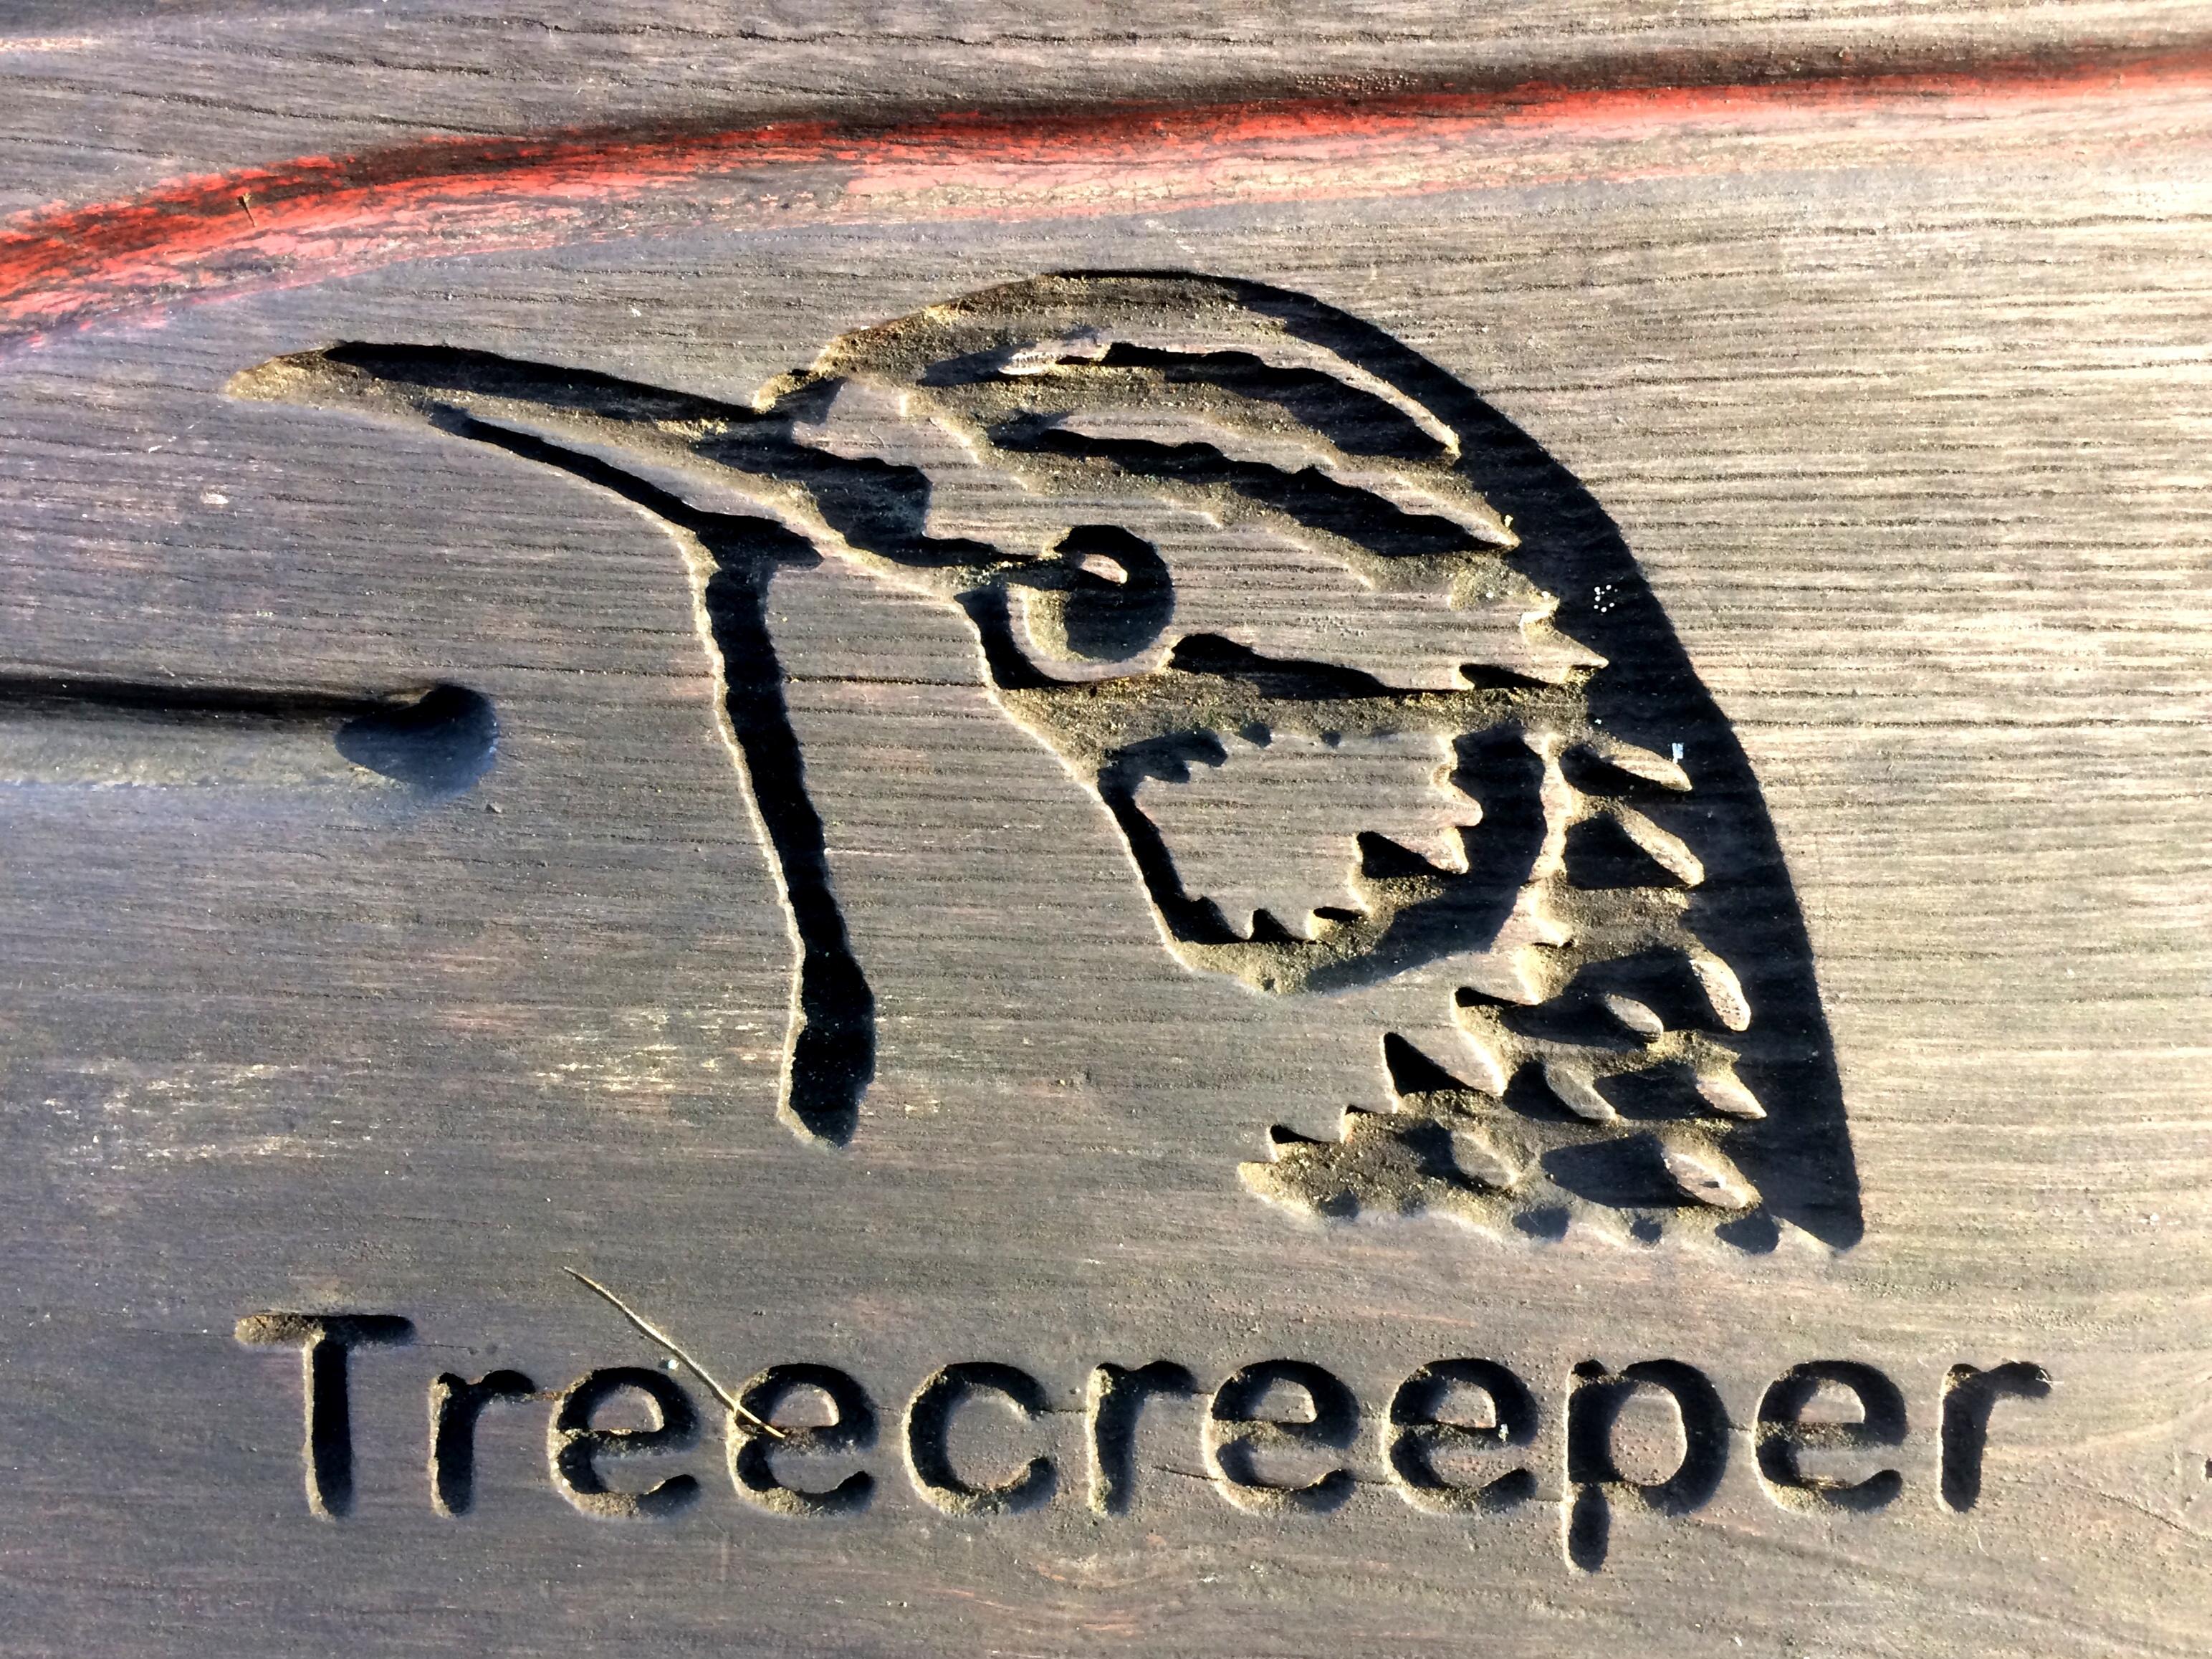 Treecreeper - The Hall of Einar - copyright David Bailey (not the)